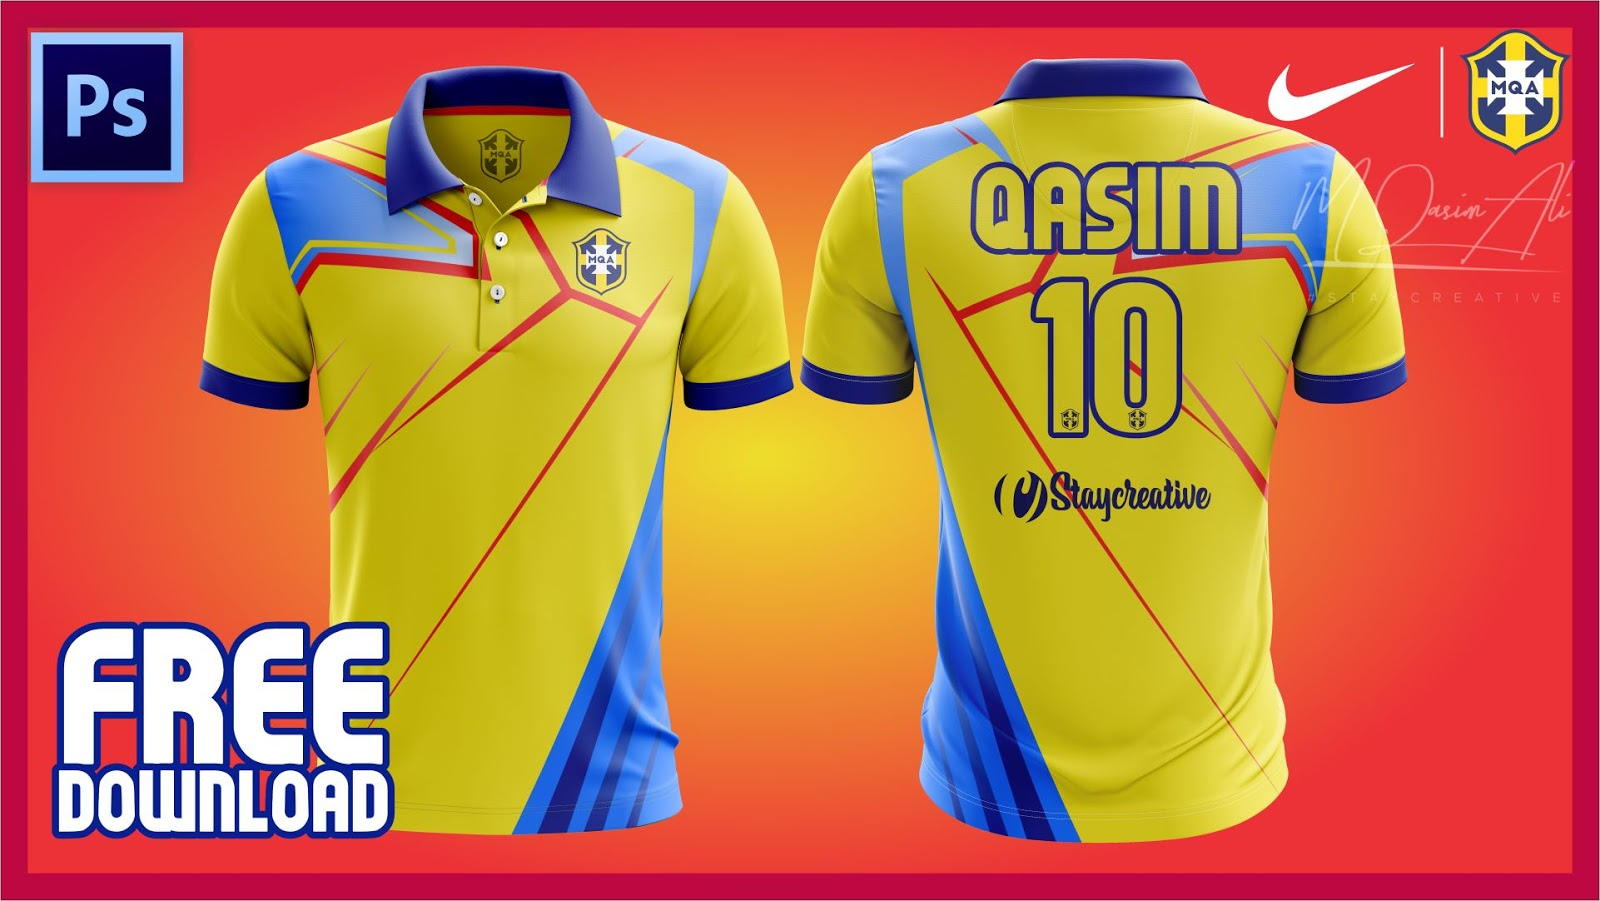 Download Epic Cricket Shirt Design Tutorial + Free Yellow image PSD ...